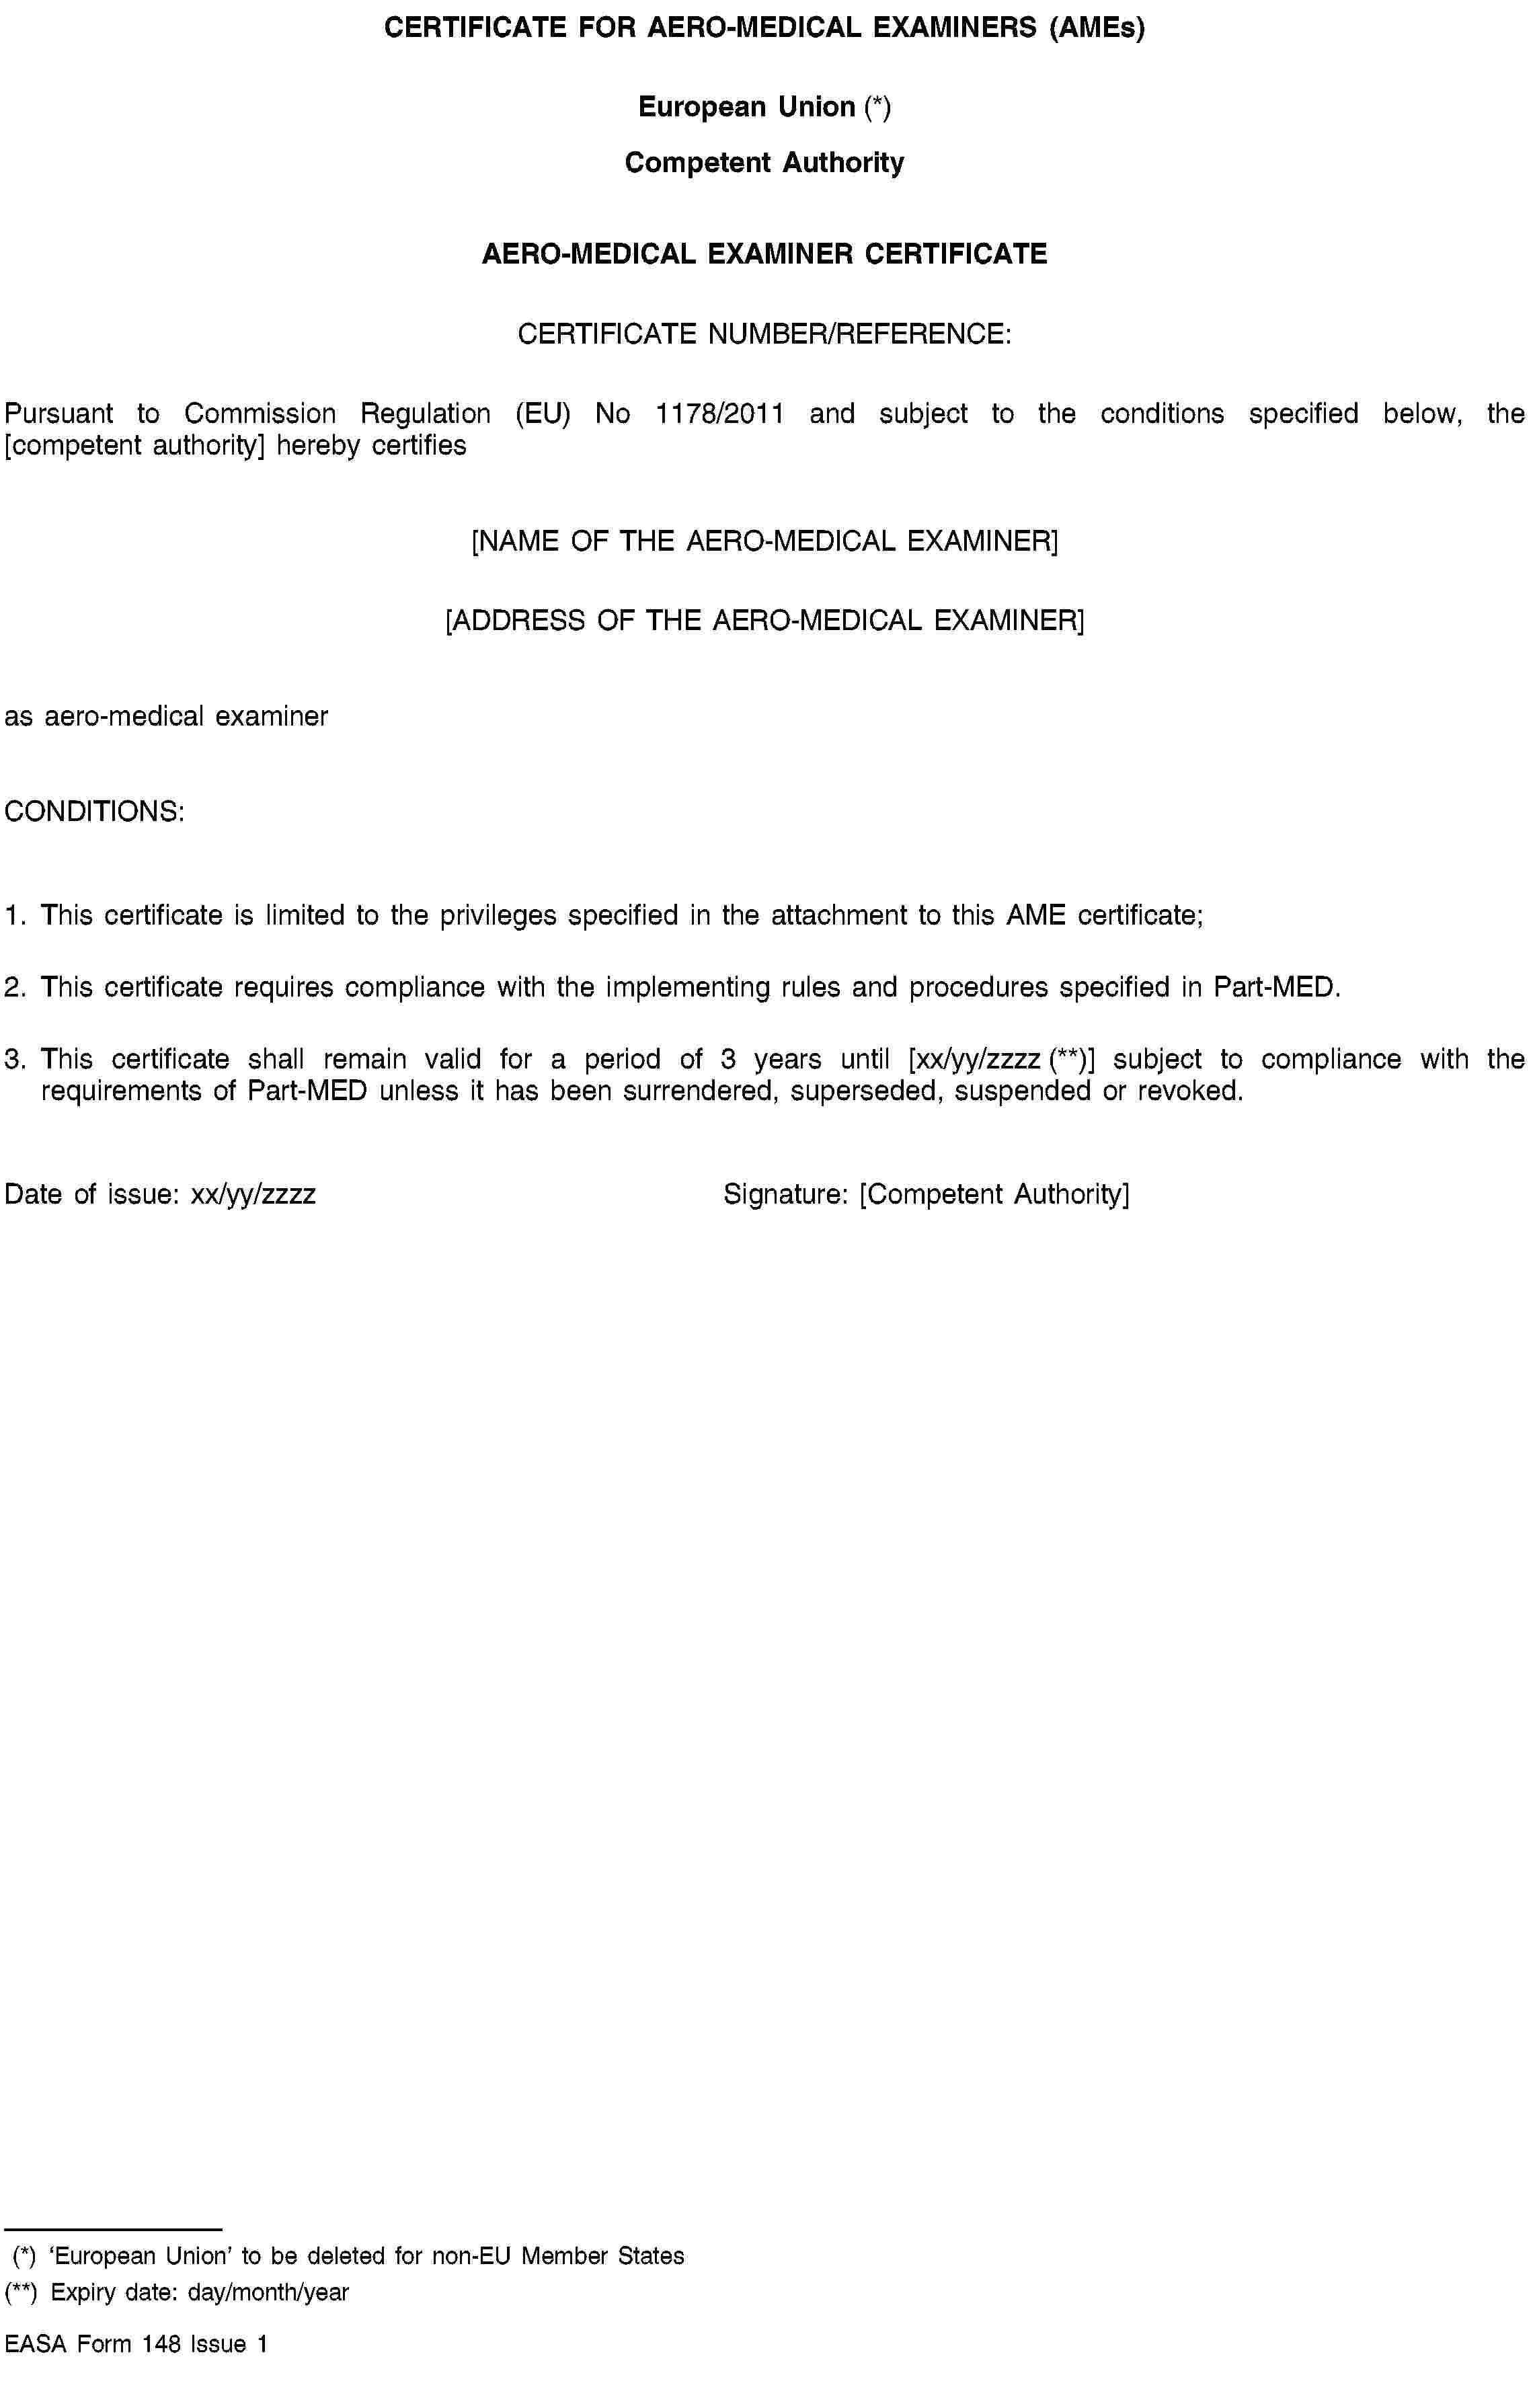 eur-lex - 02012r0290-20150408 - en